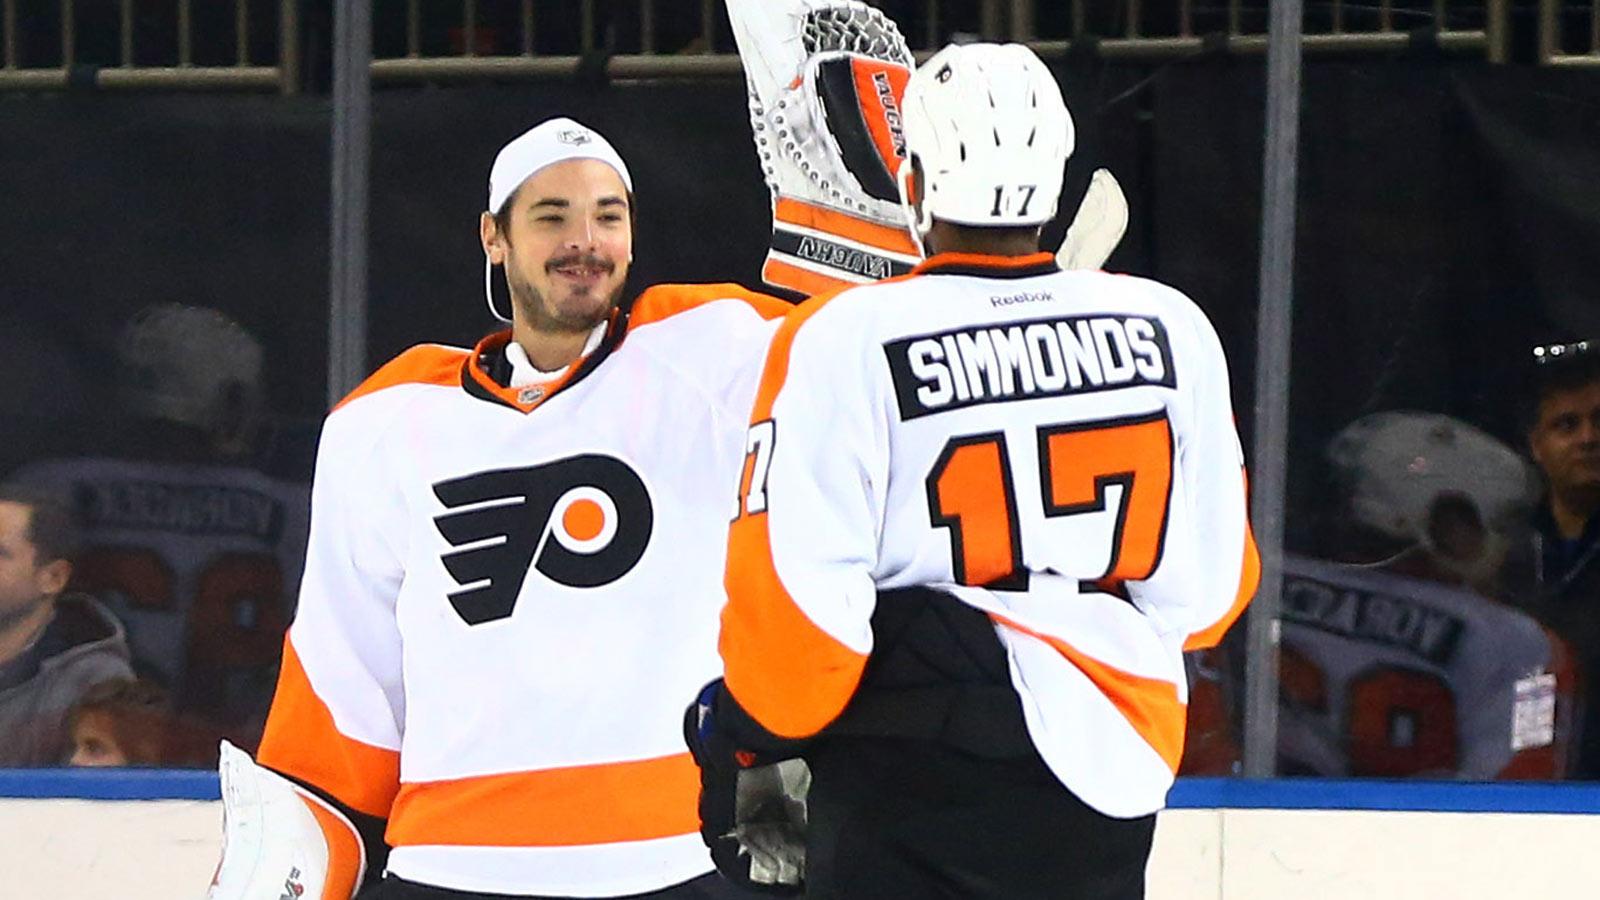 Simmonds, Mason spark Flyers' shutout victory at Rangers